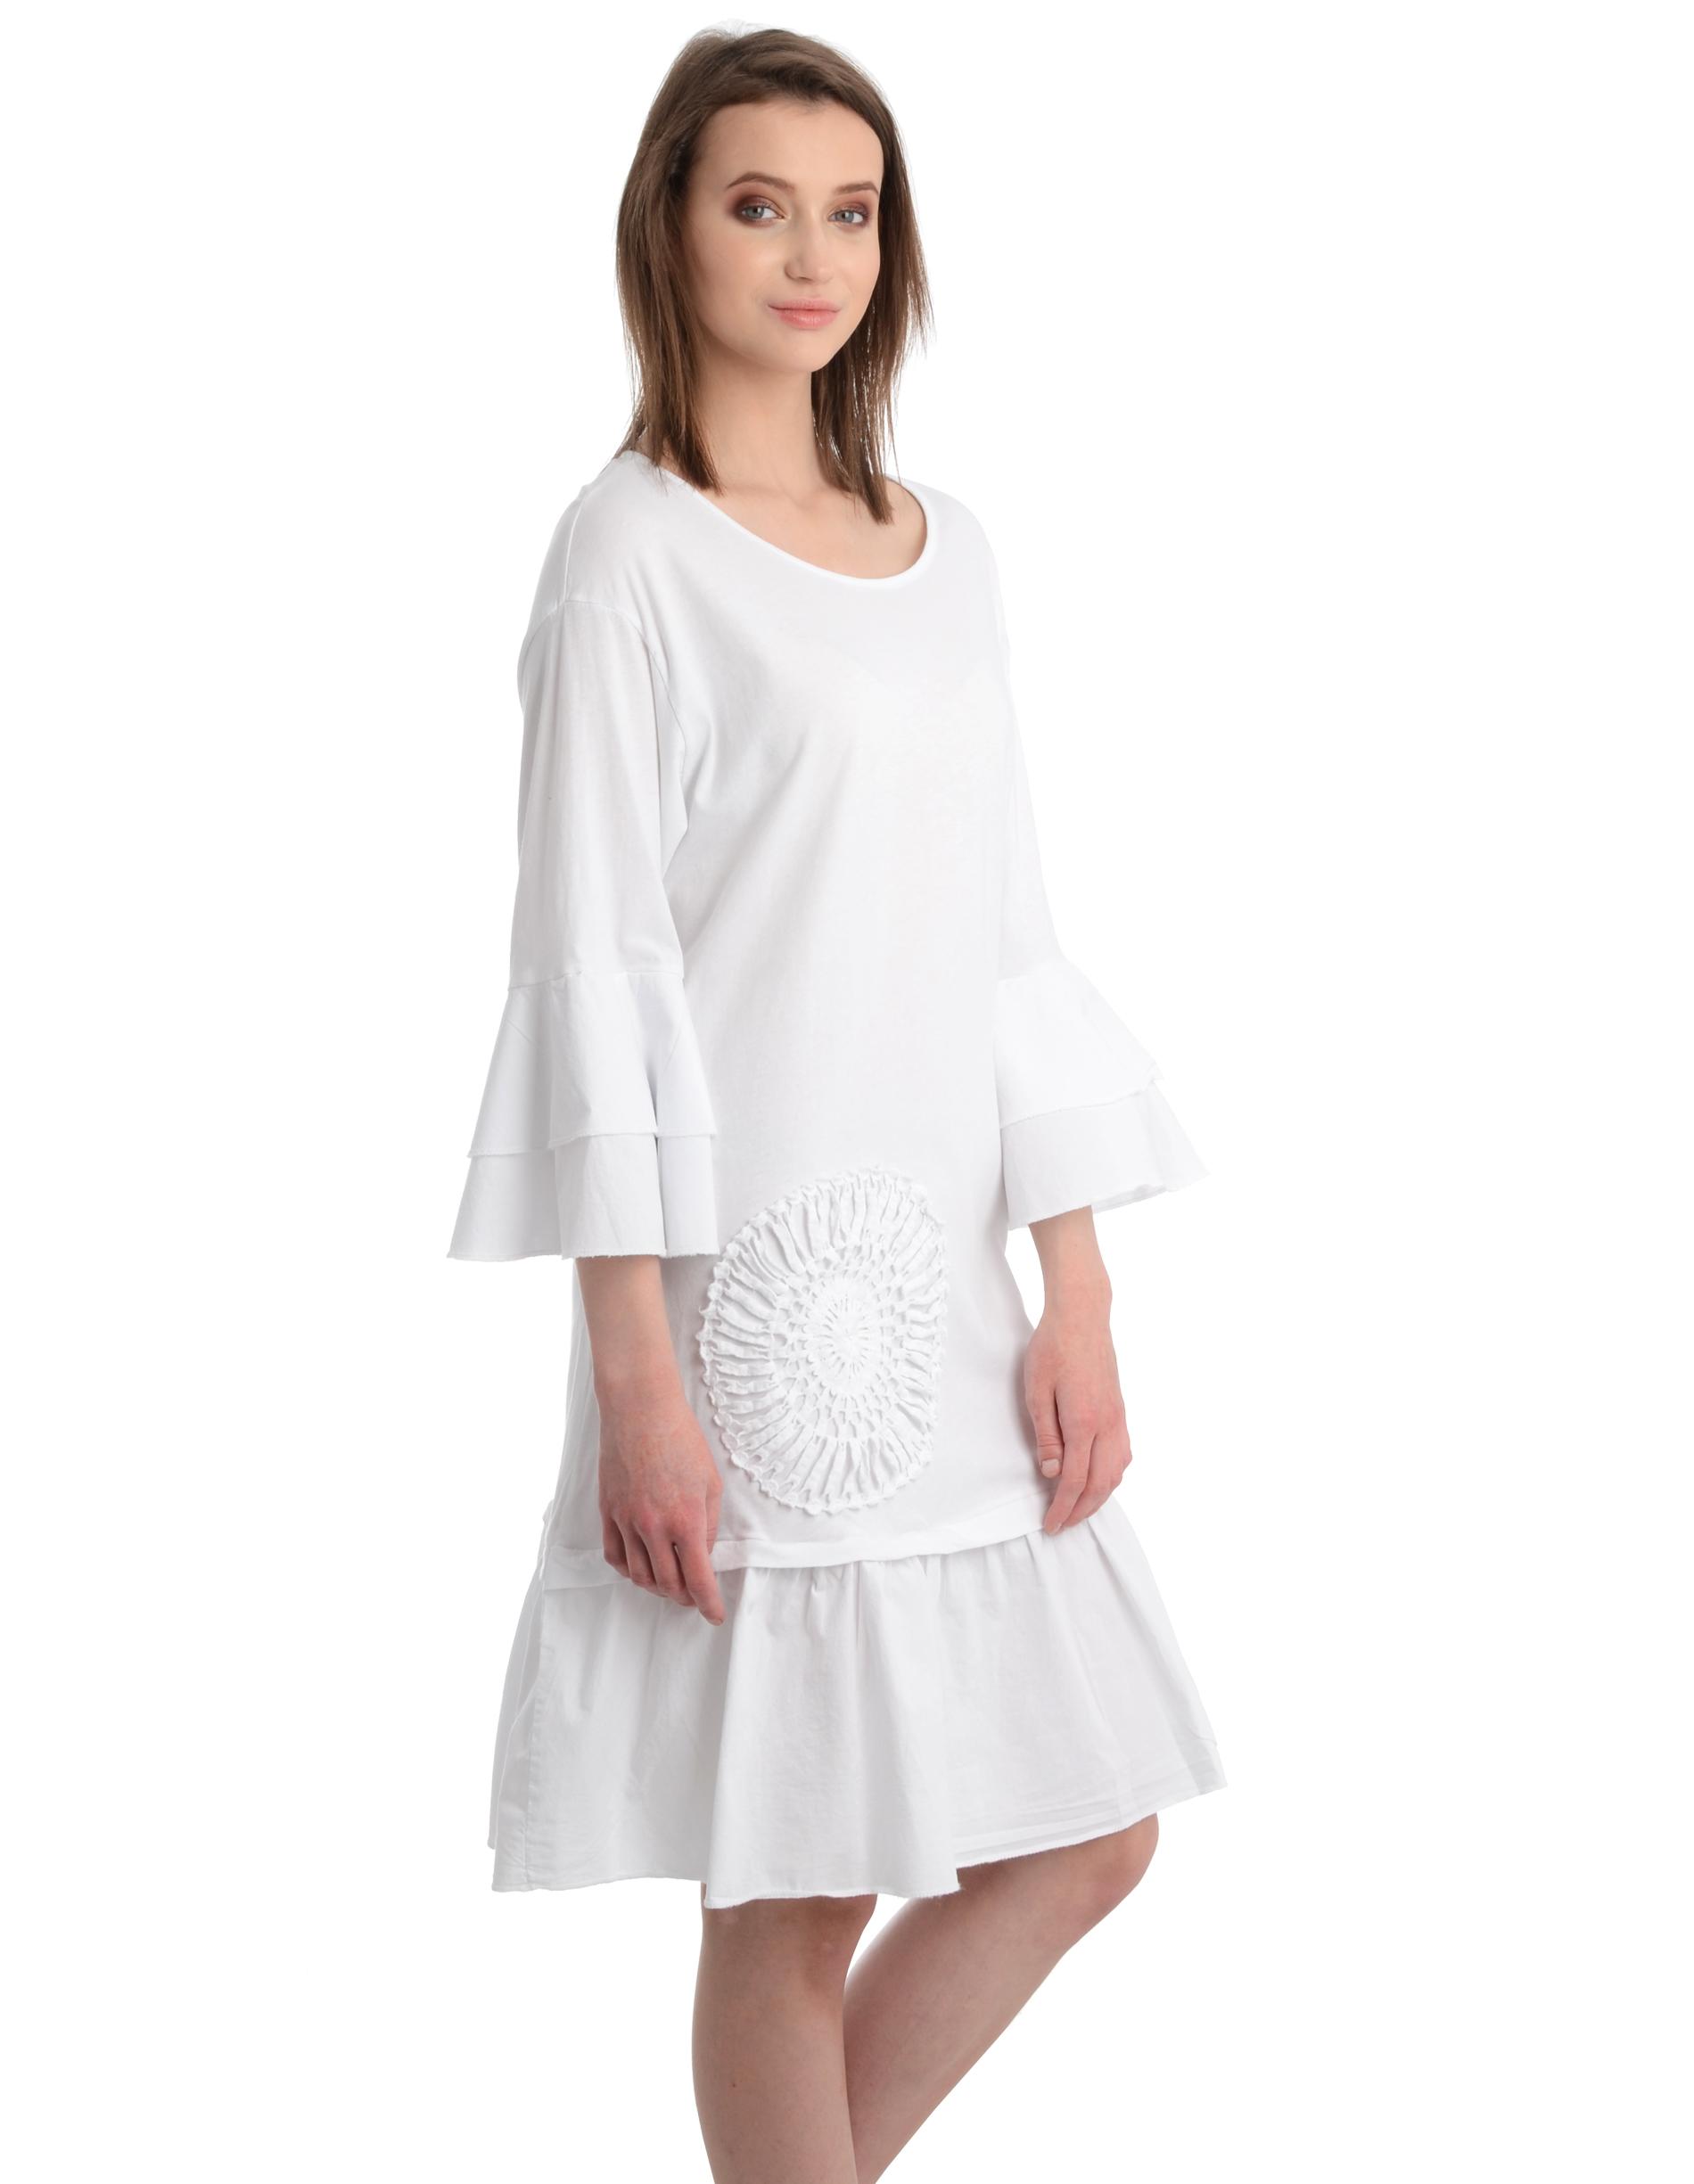 Sukienka - 62-5663 BIANC - Unisono